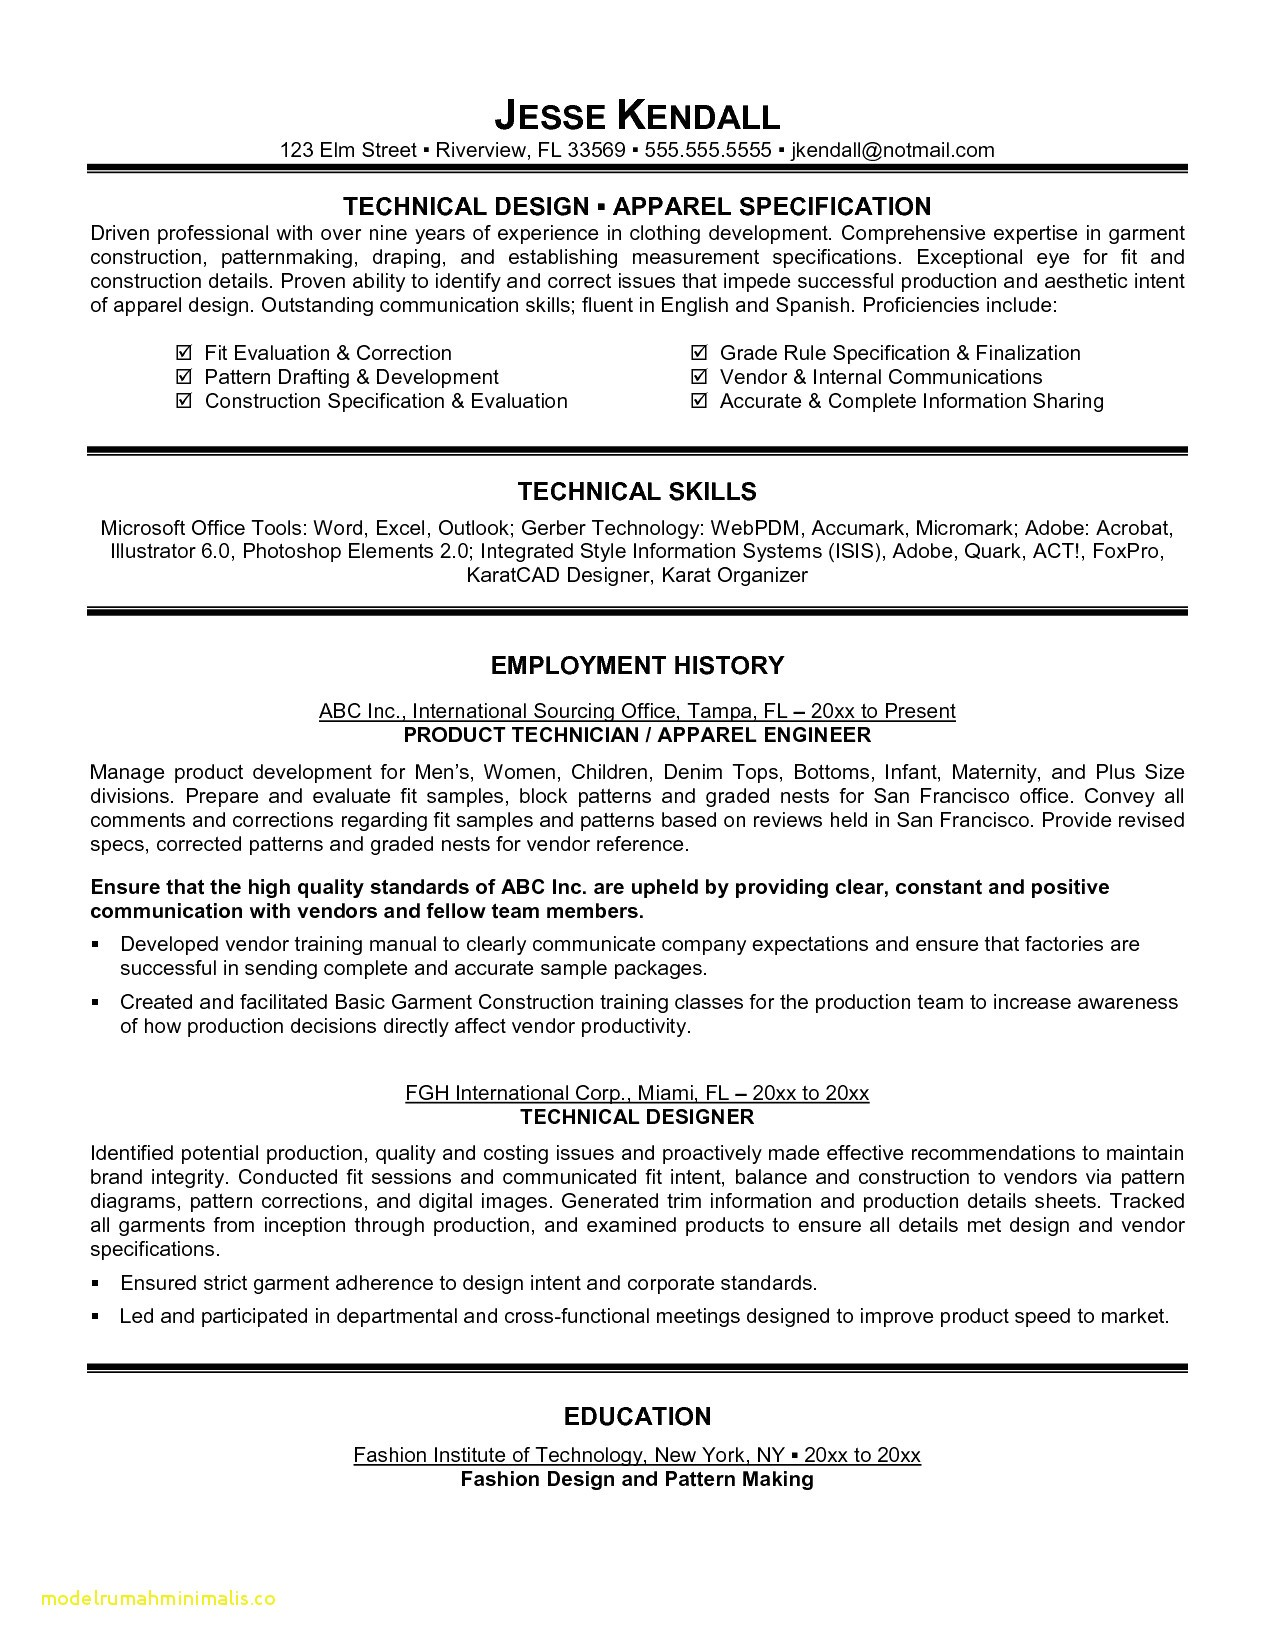 top result free resume builder microsoft word unique sales resume template word luxury free microsoft resume templates image 2018 hzt6